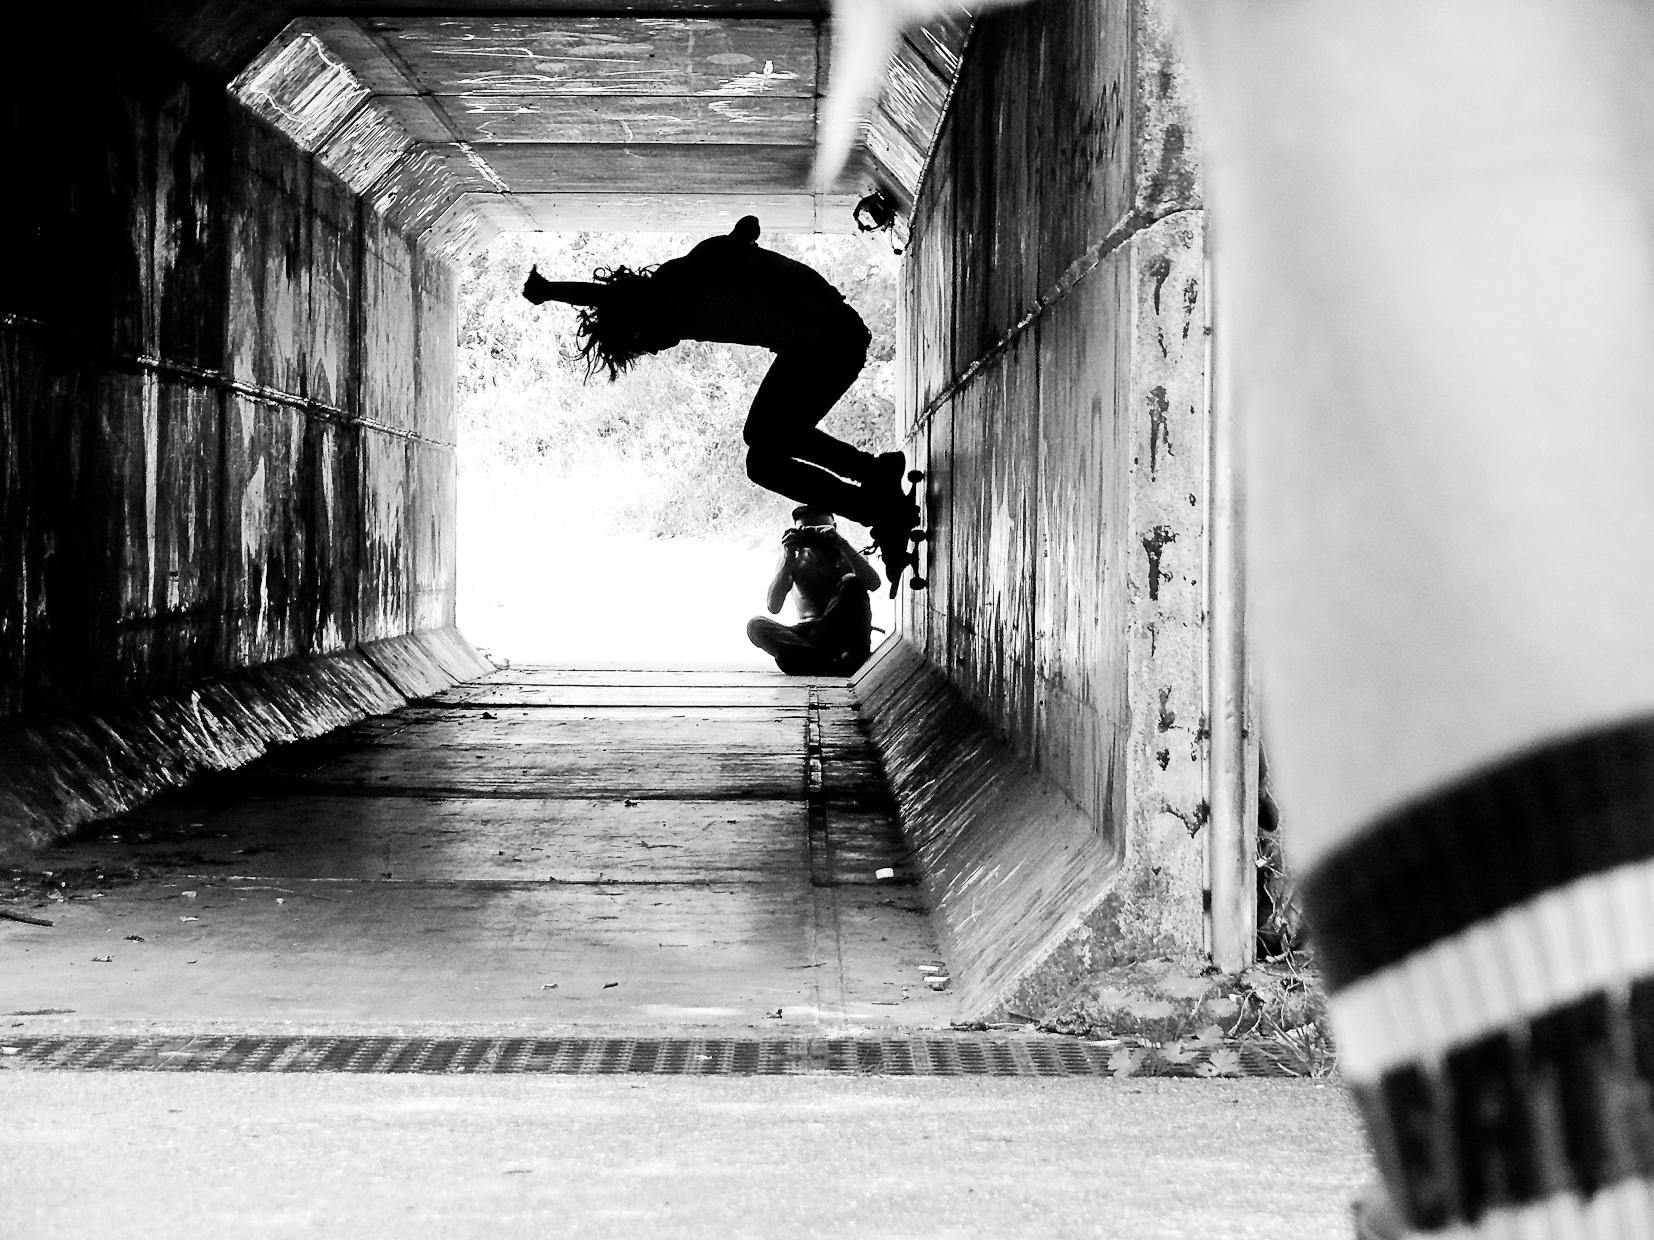 skateboarding - timotheblandin | ello